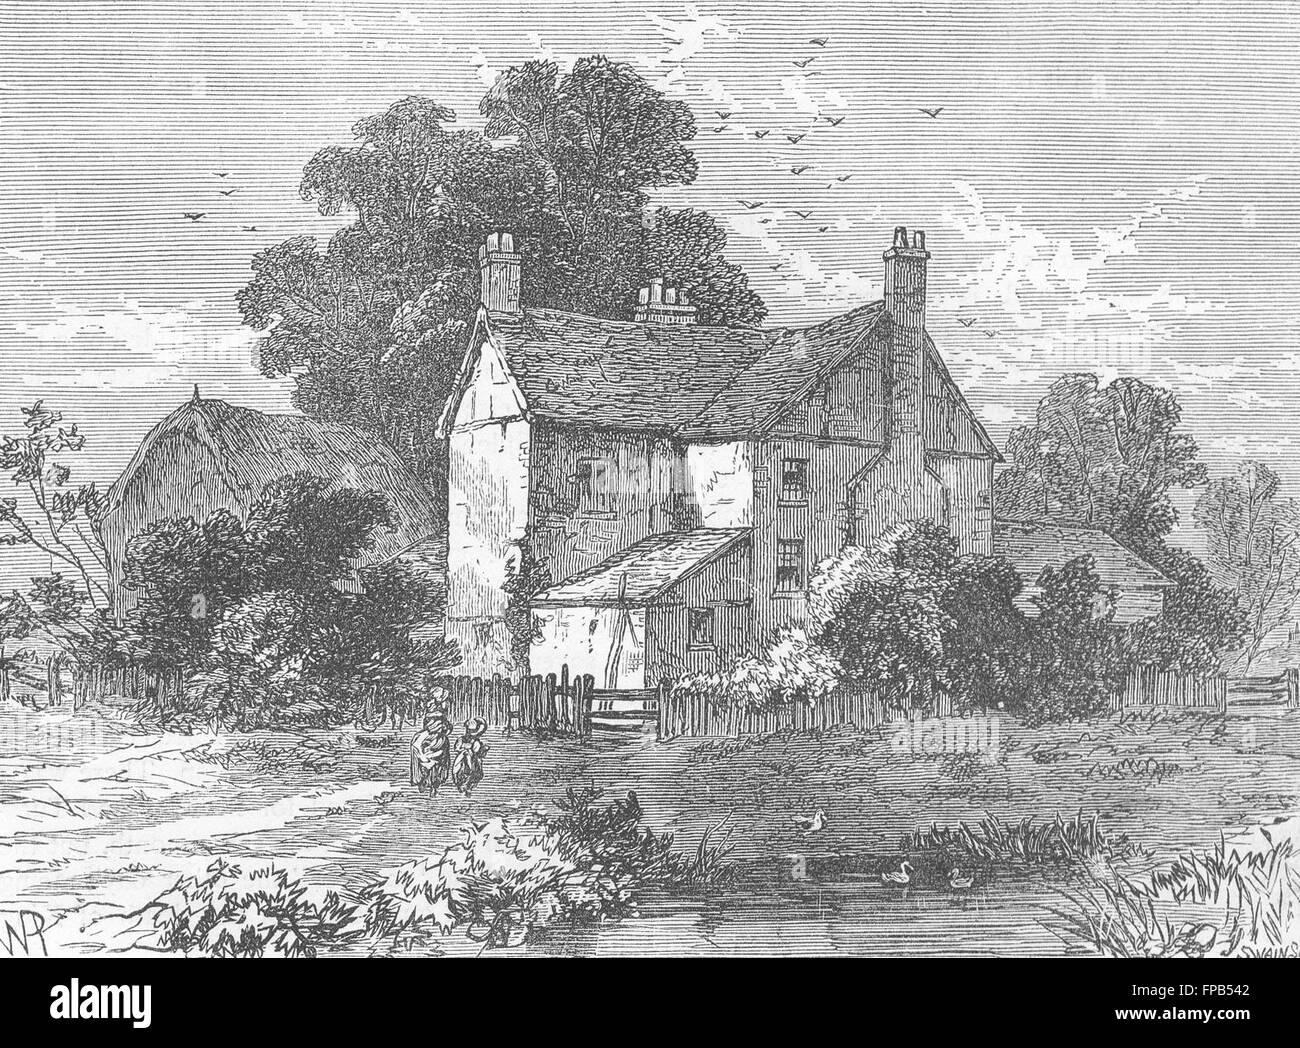 LONDON: Notting Hill: Portobello Farm, 1830, antique print 1880 - Stock Image